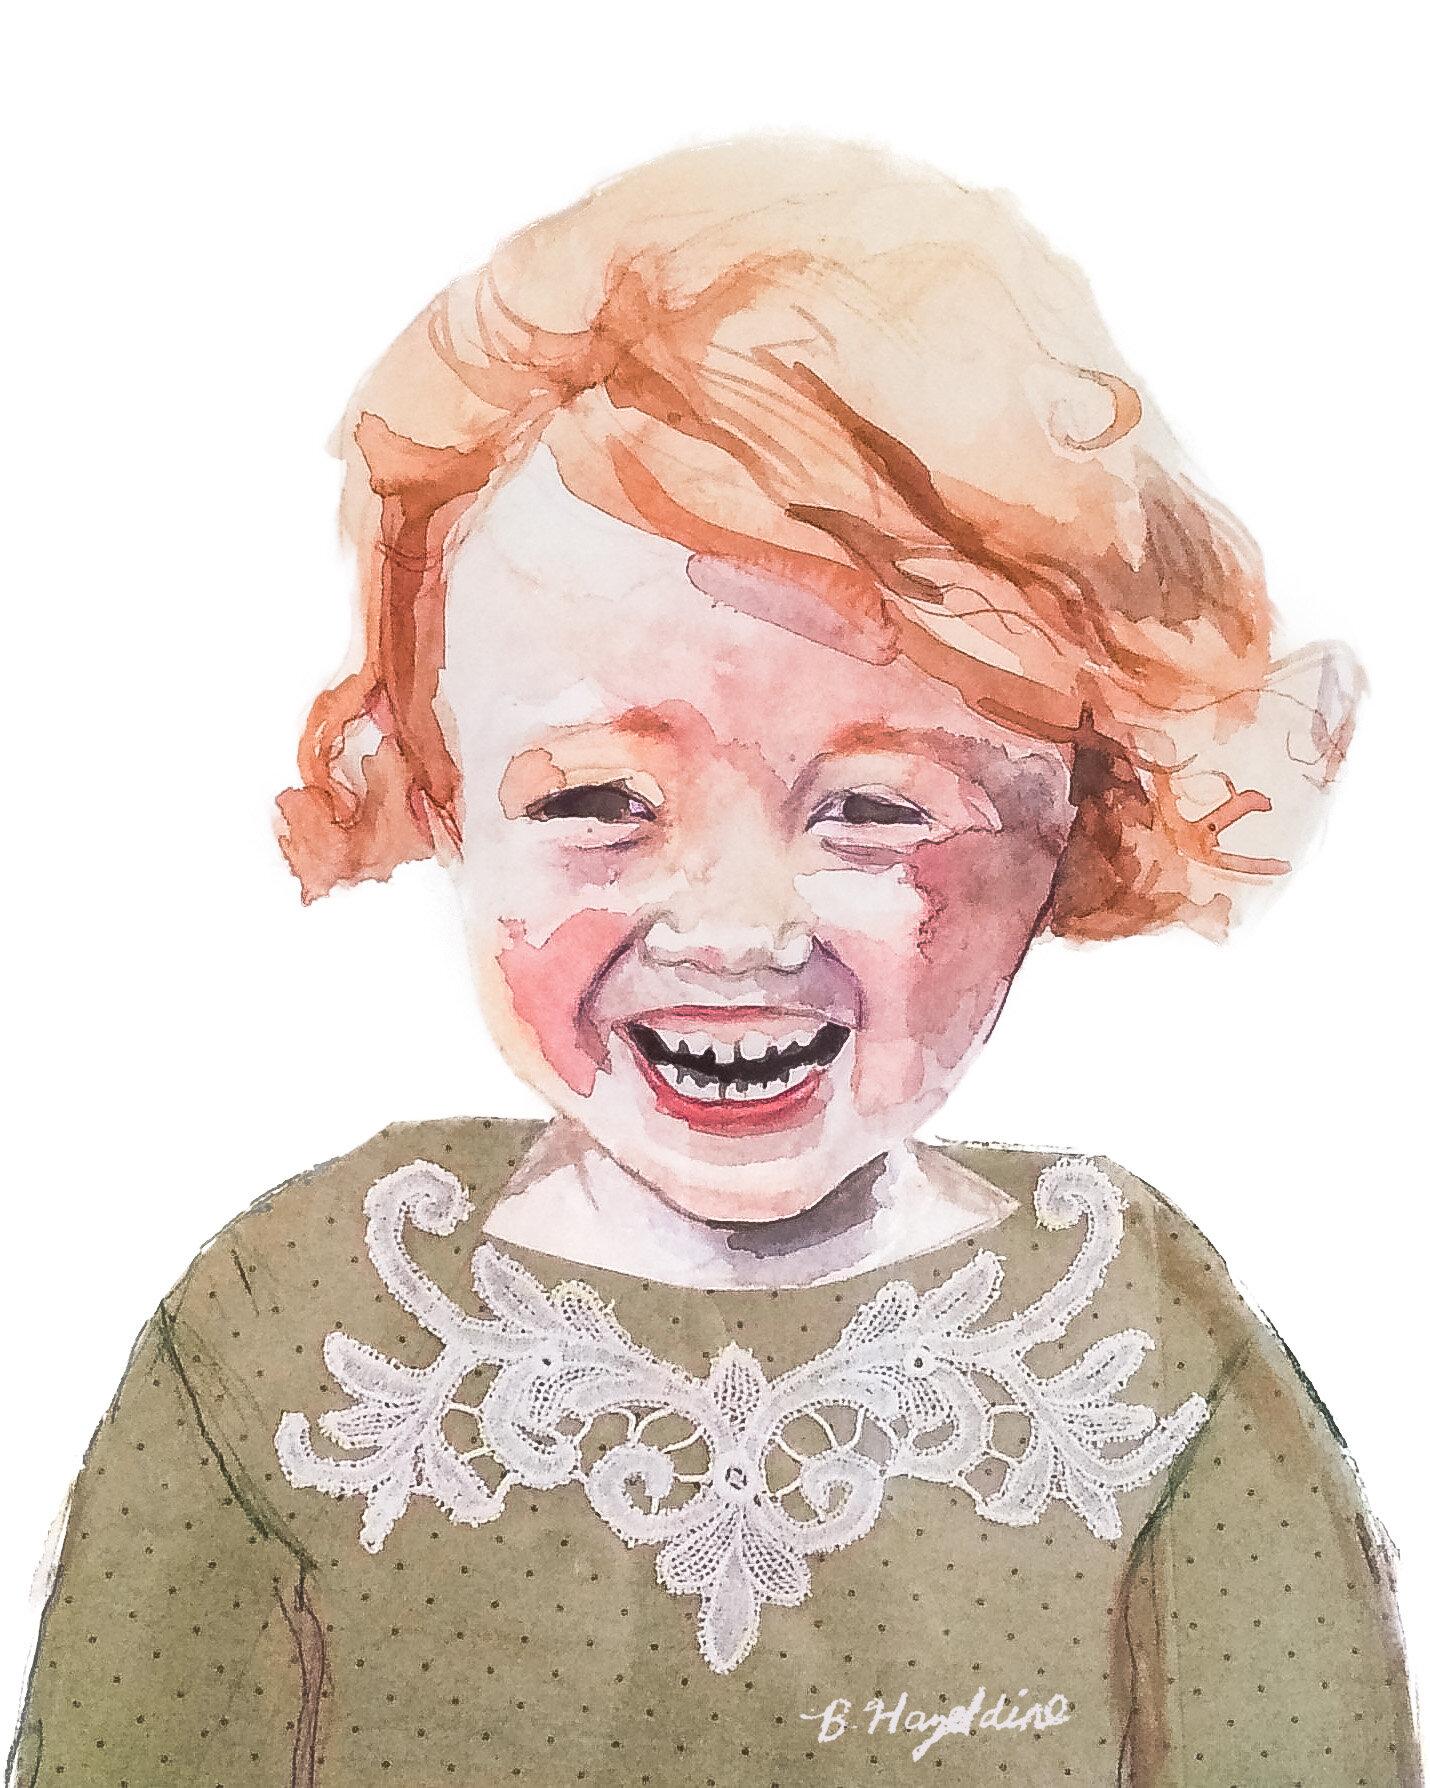 Redhead Girl with Big Smile. Children's Portrait Artist Surrey. Painting by Brittany Hazeldine.